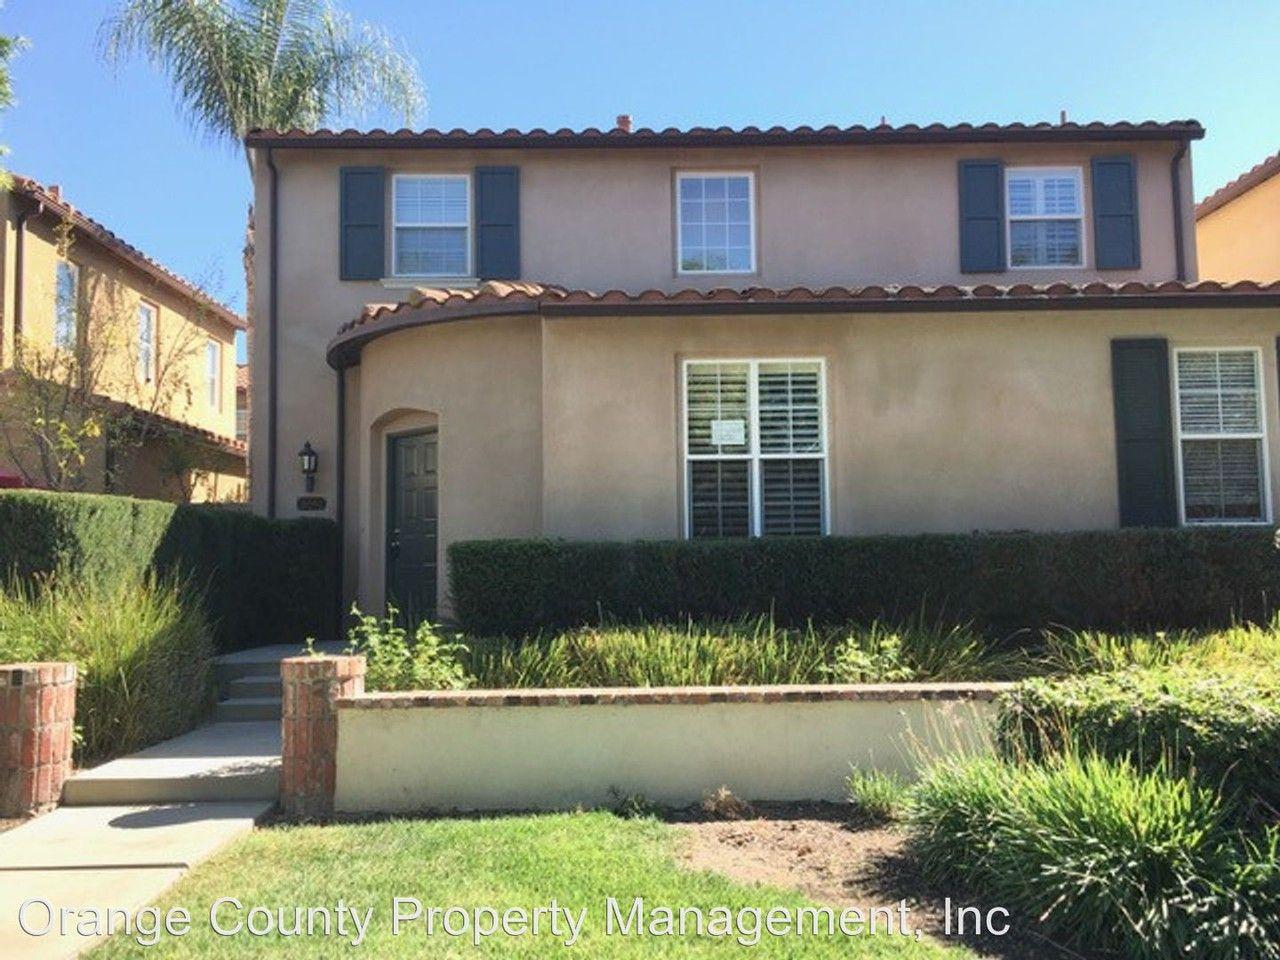 16090 Valley Oak, Irvine, CA 92618 3 Bedroom House for ...